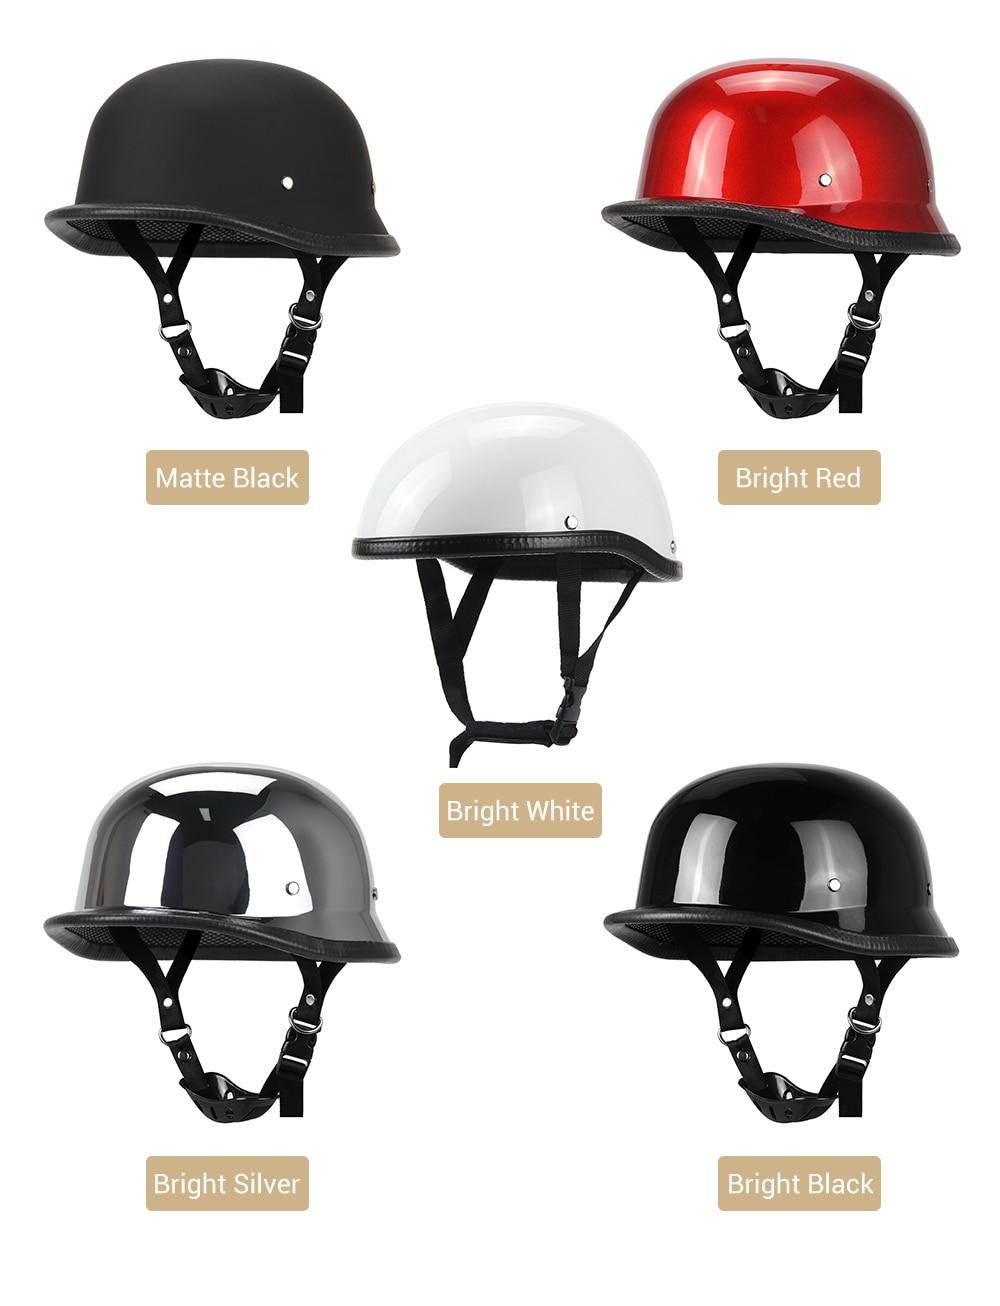 Pilot Style Motorcycle Helmet : pilot, style, motorcycle, helmet, HEROBIKER, Motorcycle, Helmet, German, Leather, Style, Pilot, Retro, Cruise, Chopper, Biker, S|Helmets|, AliExpress